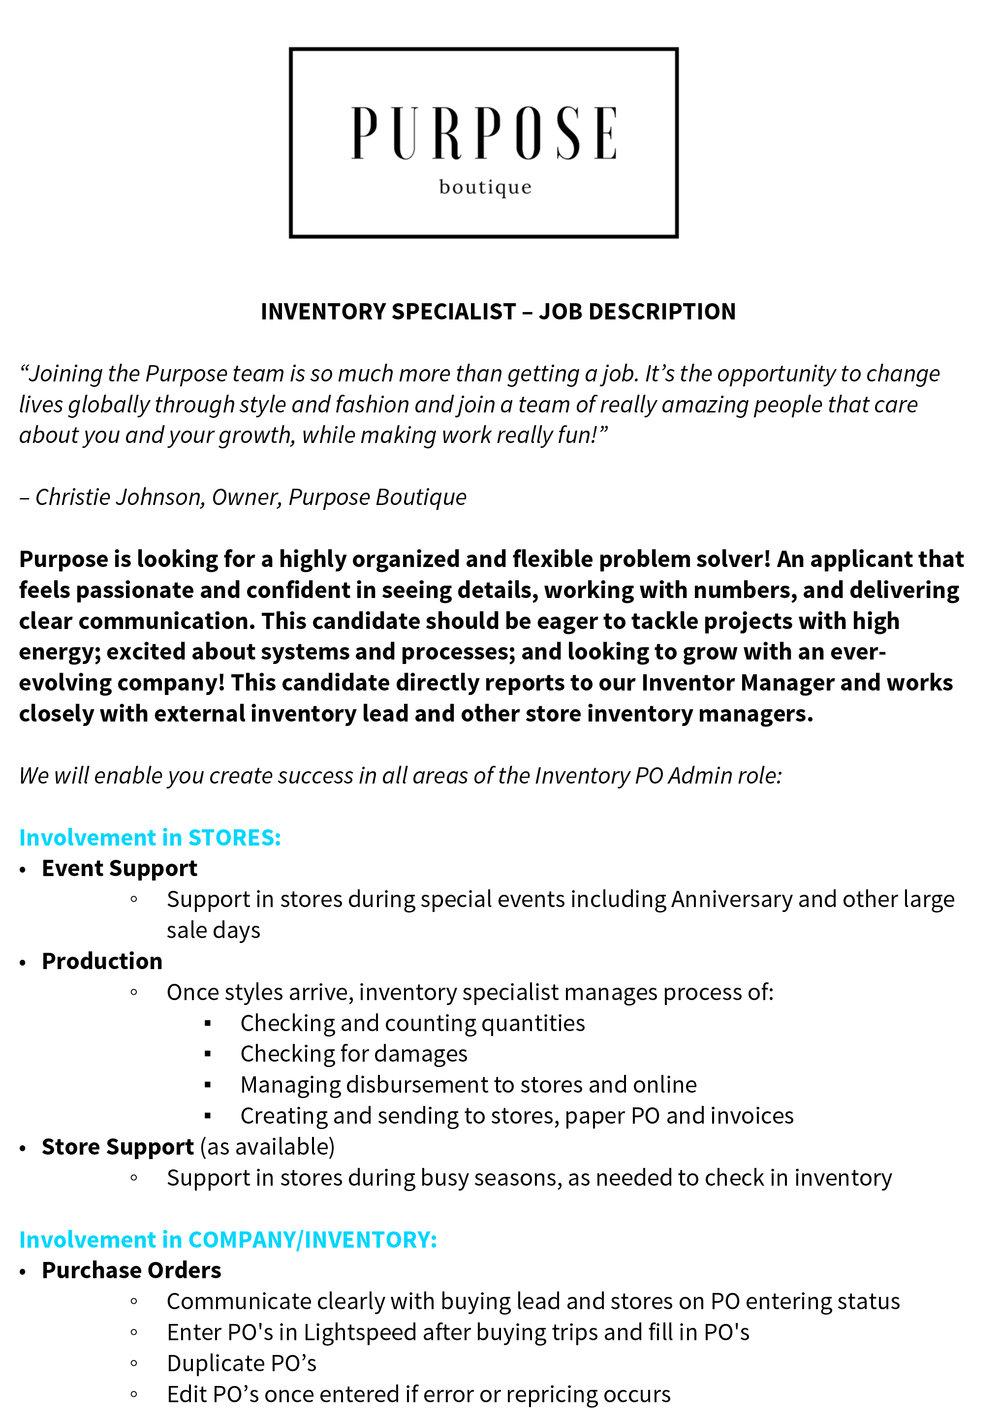 application inventory specialist purpose boutique